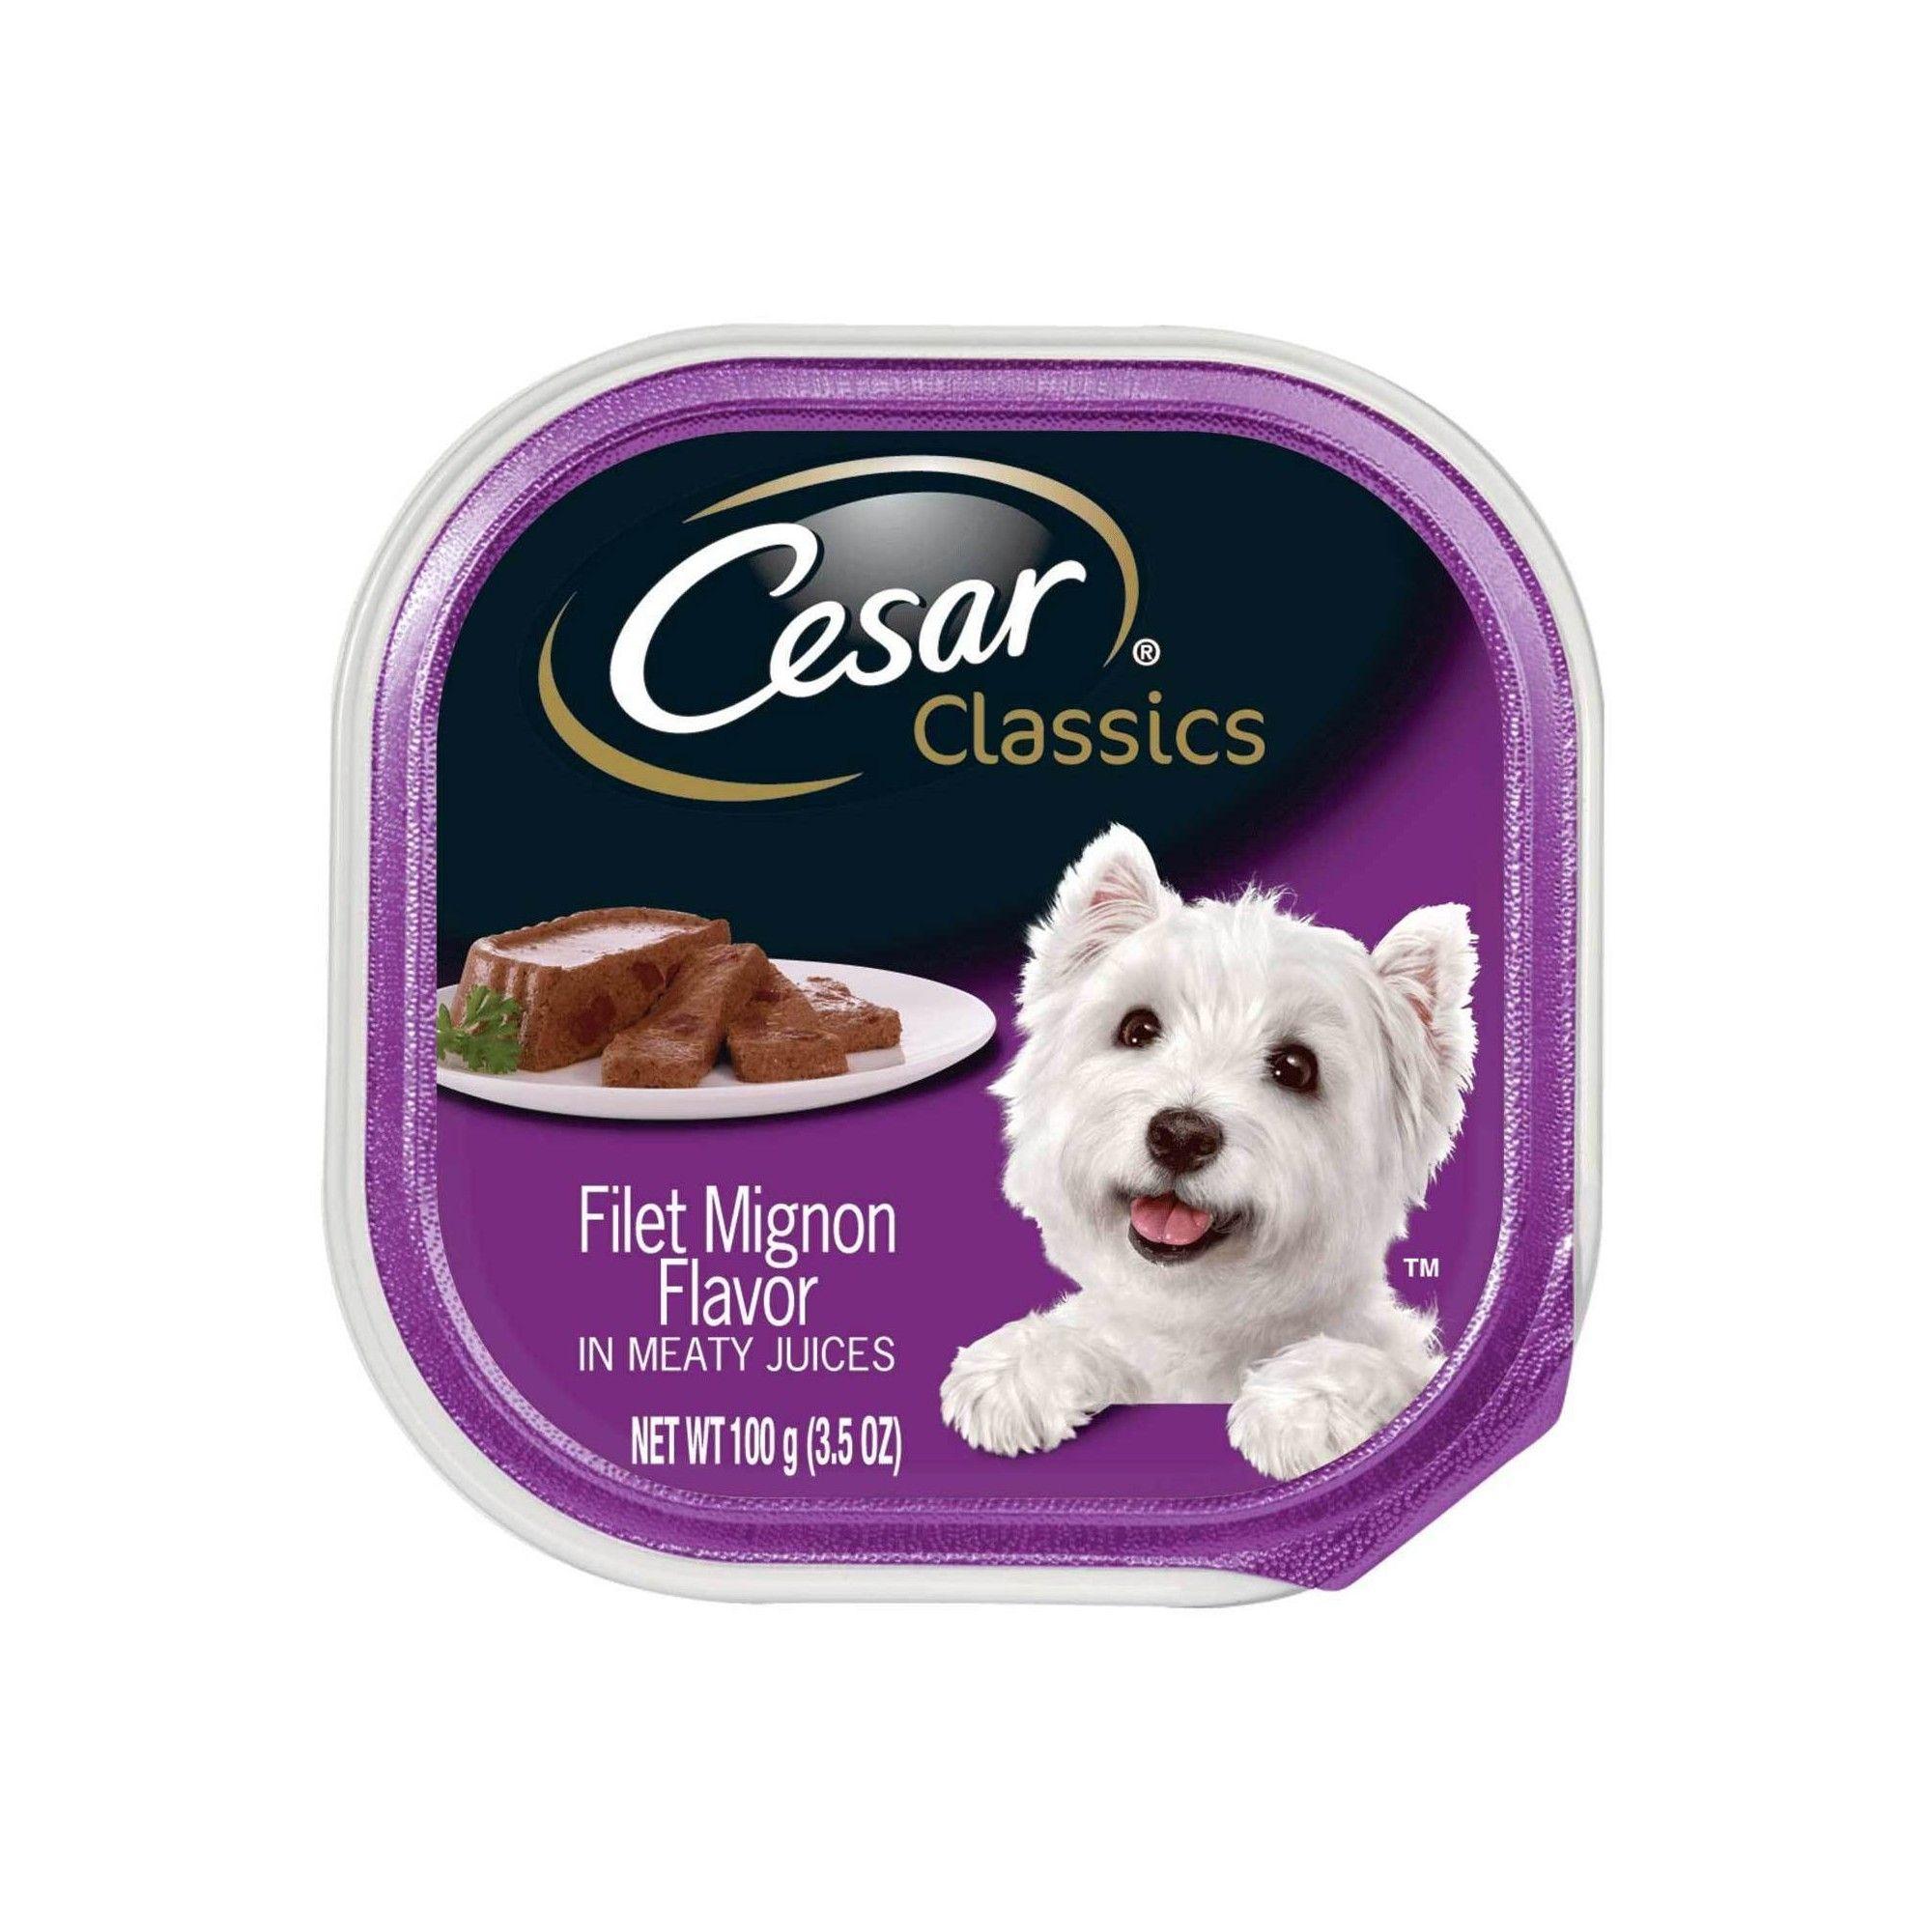 Cesar Canine Cuisine Filet Mignon Flavor Wet Dog Food 3 5oz Tray